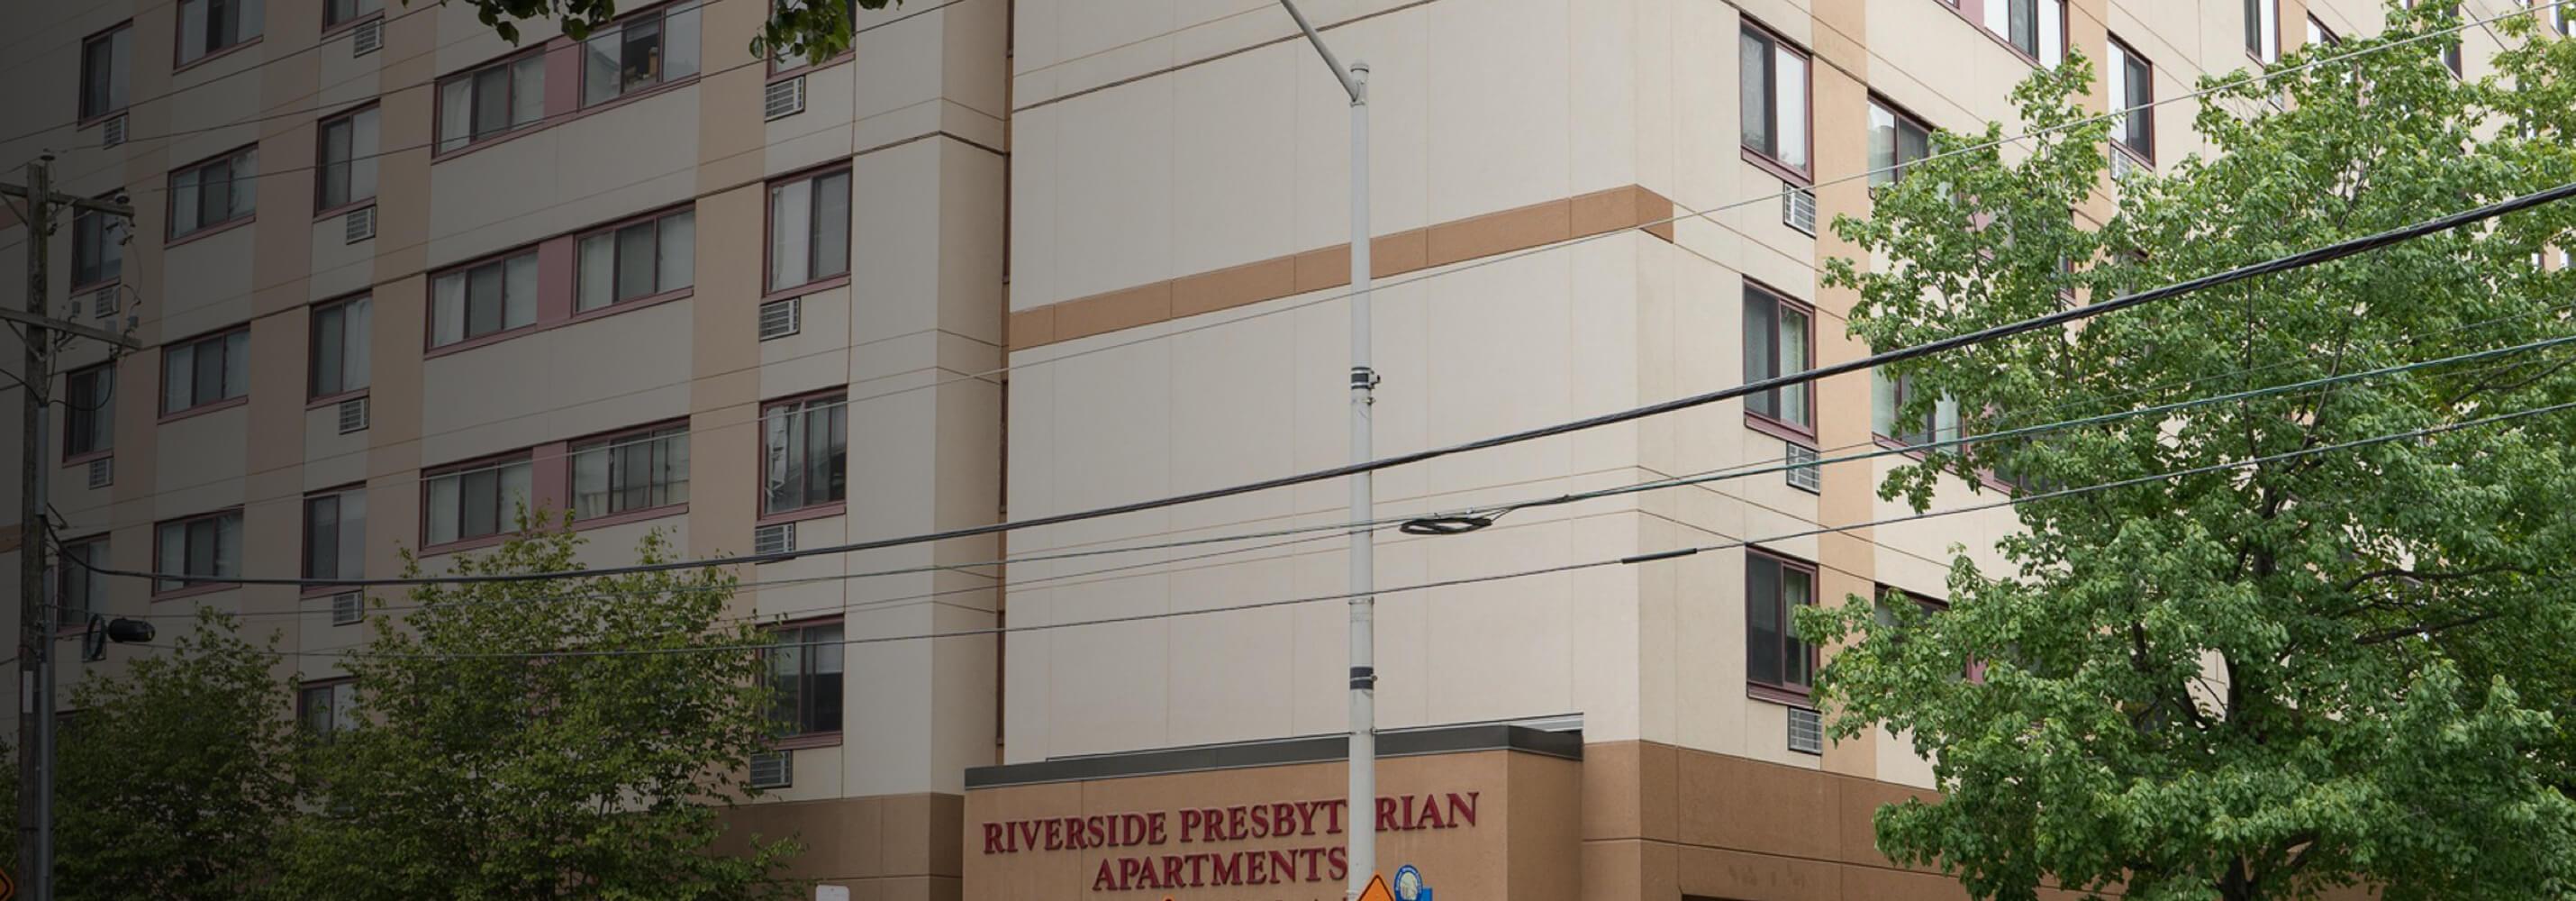 Riverside Presbyterian Apts